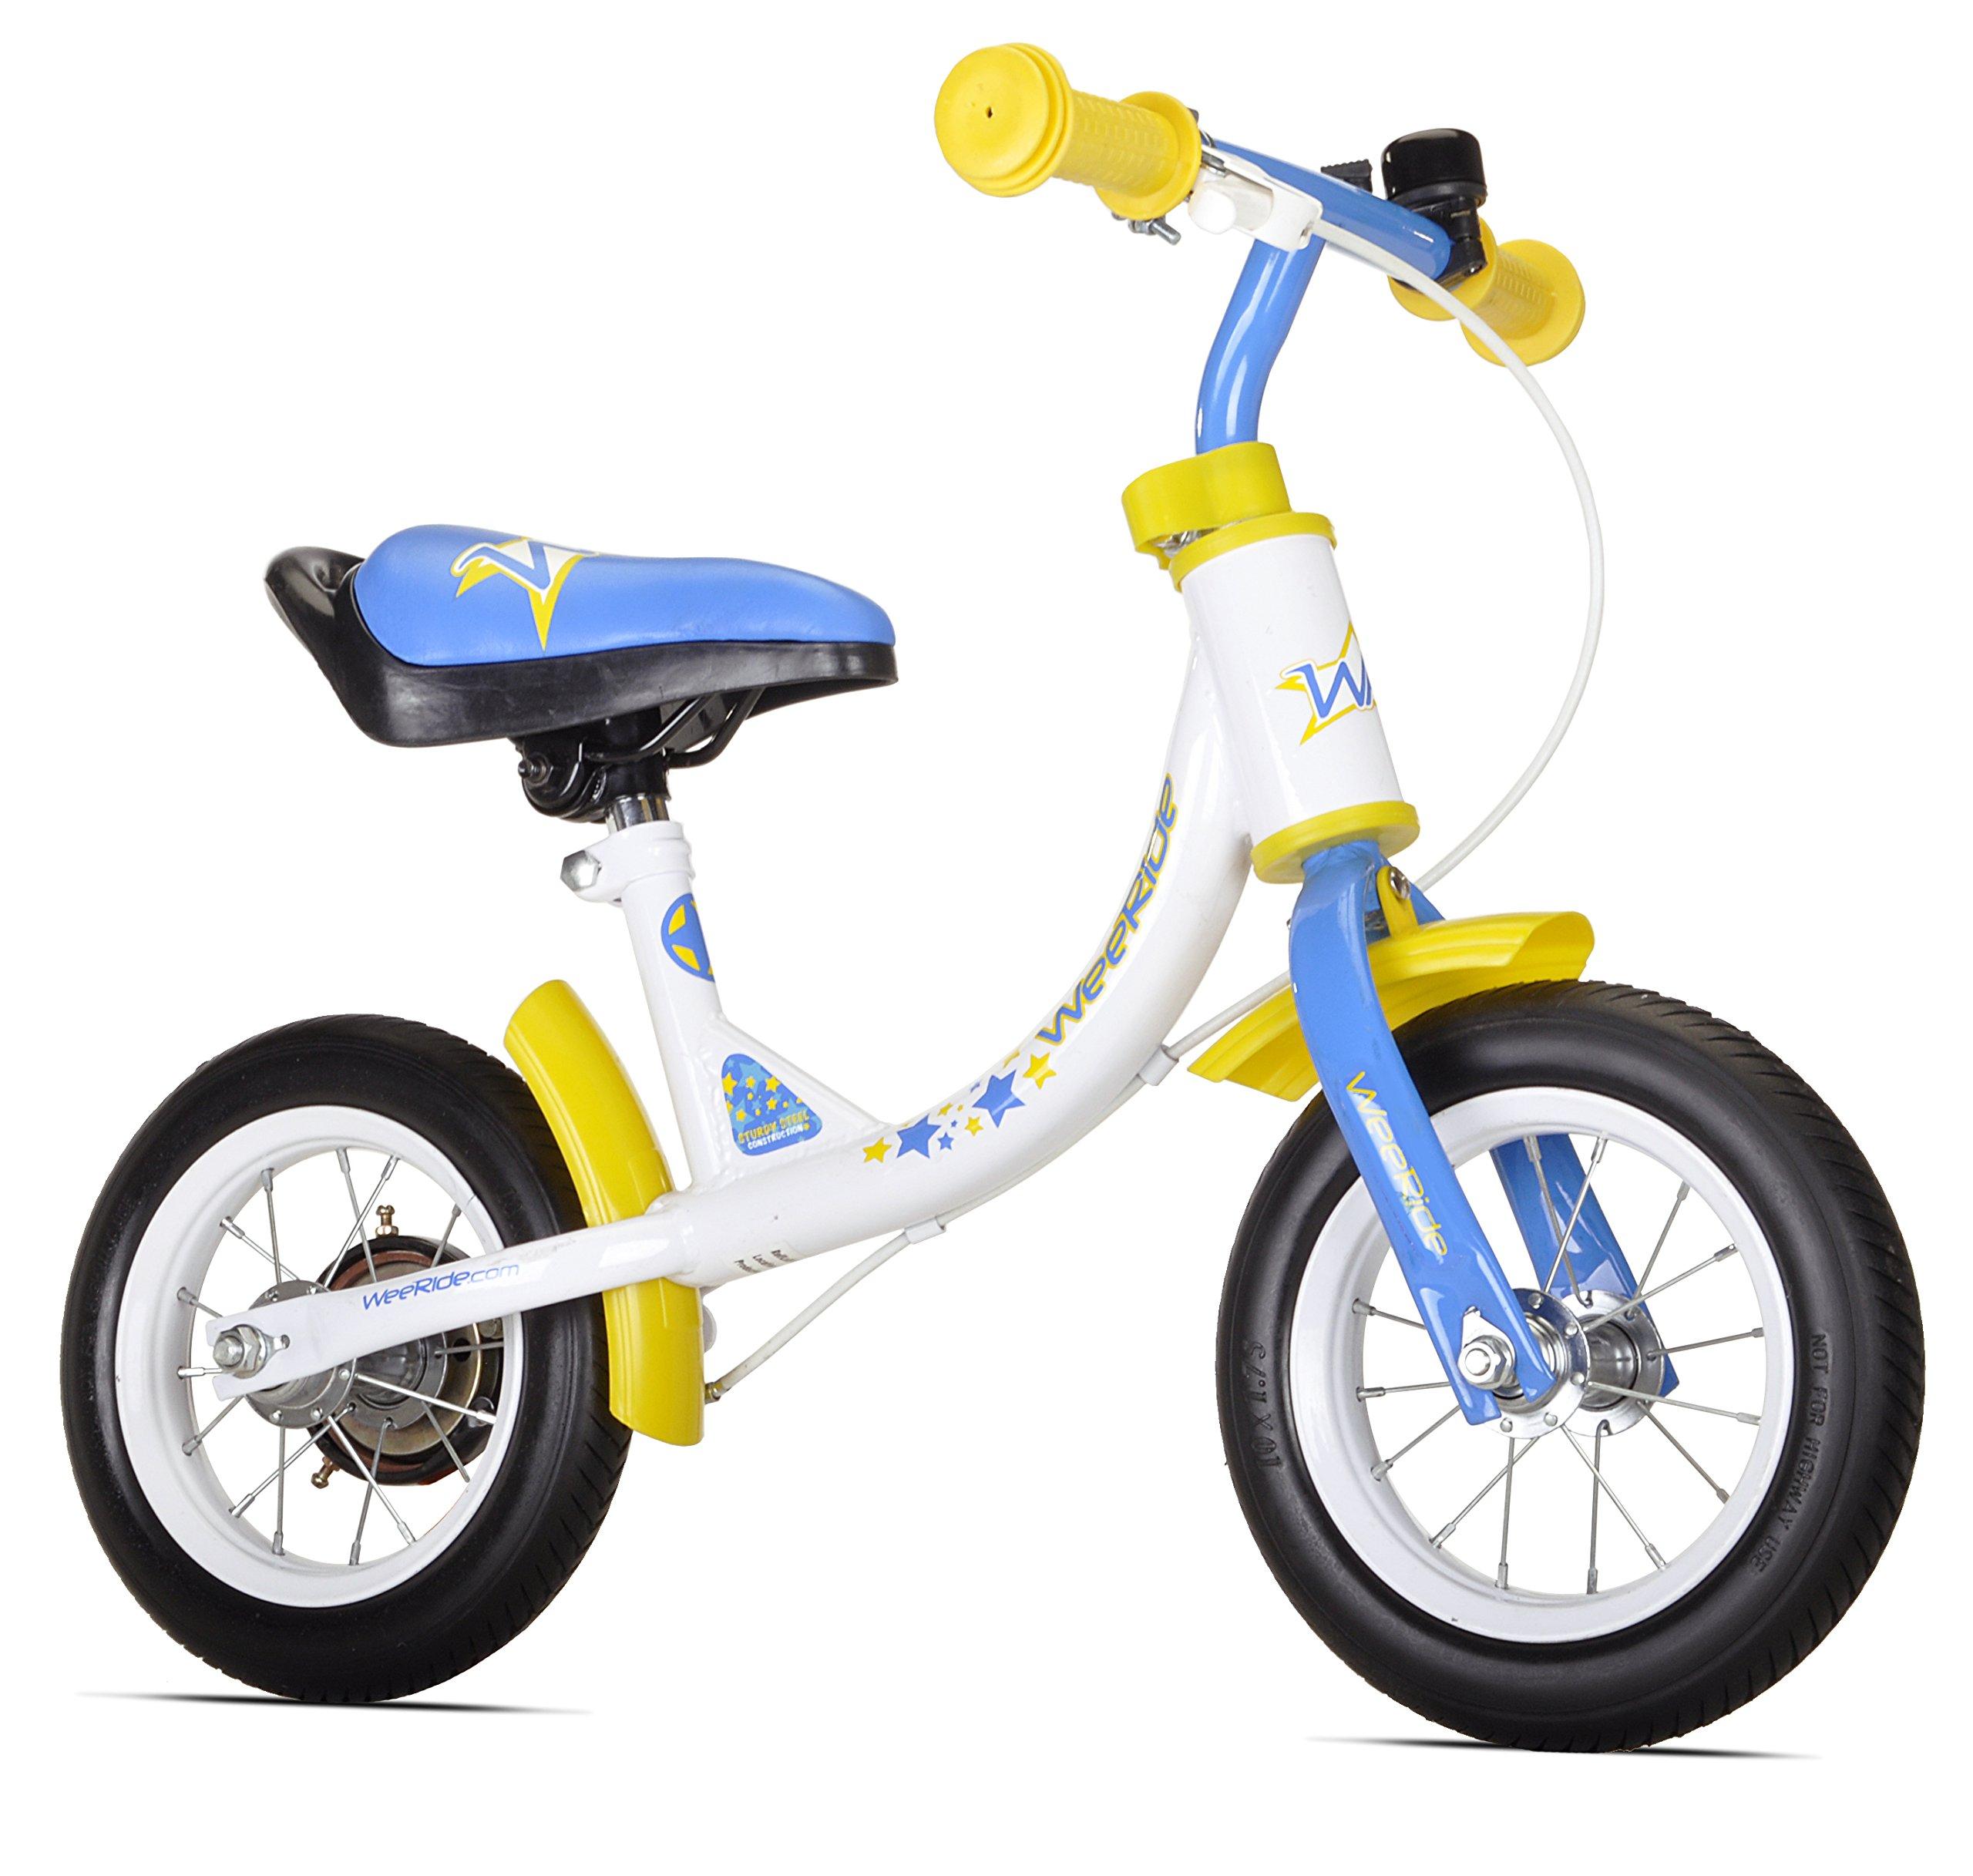 WeeRide Learn 2 Ride Balance Bike, White, 10-Inch by WeeRide